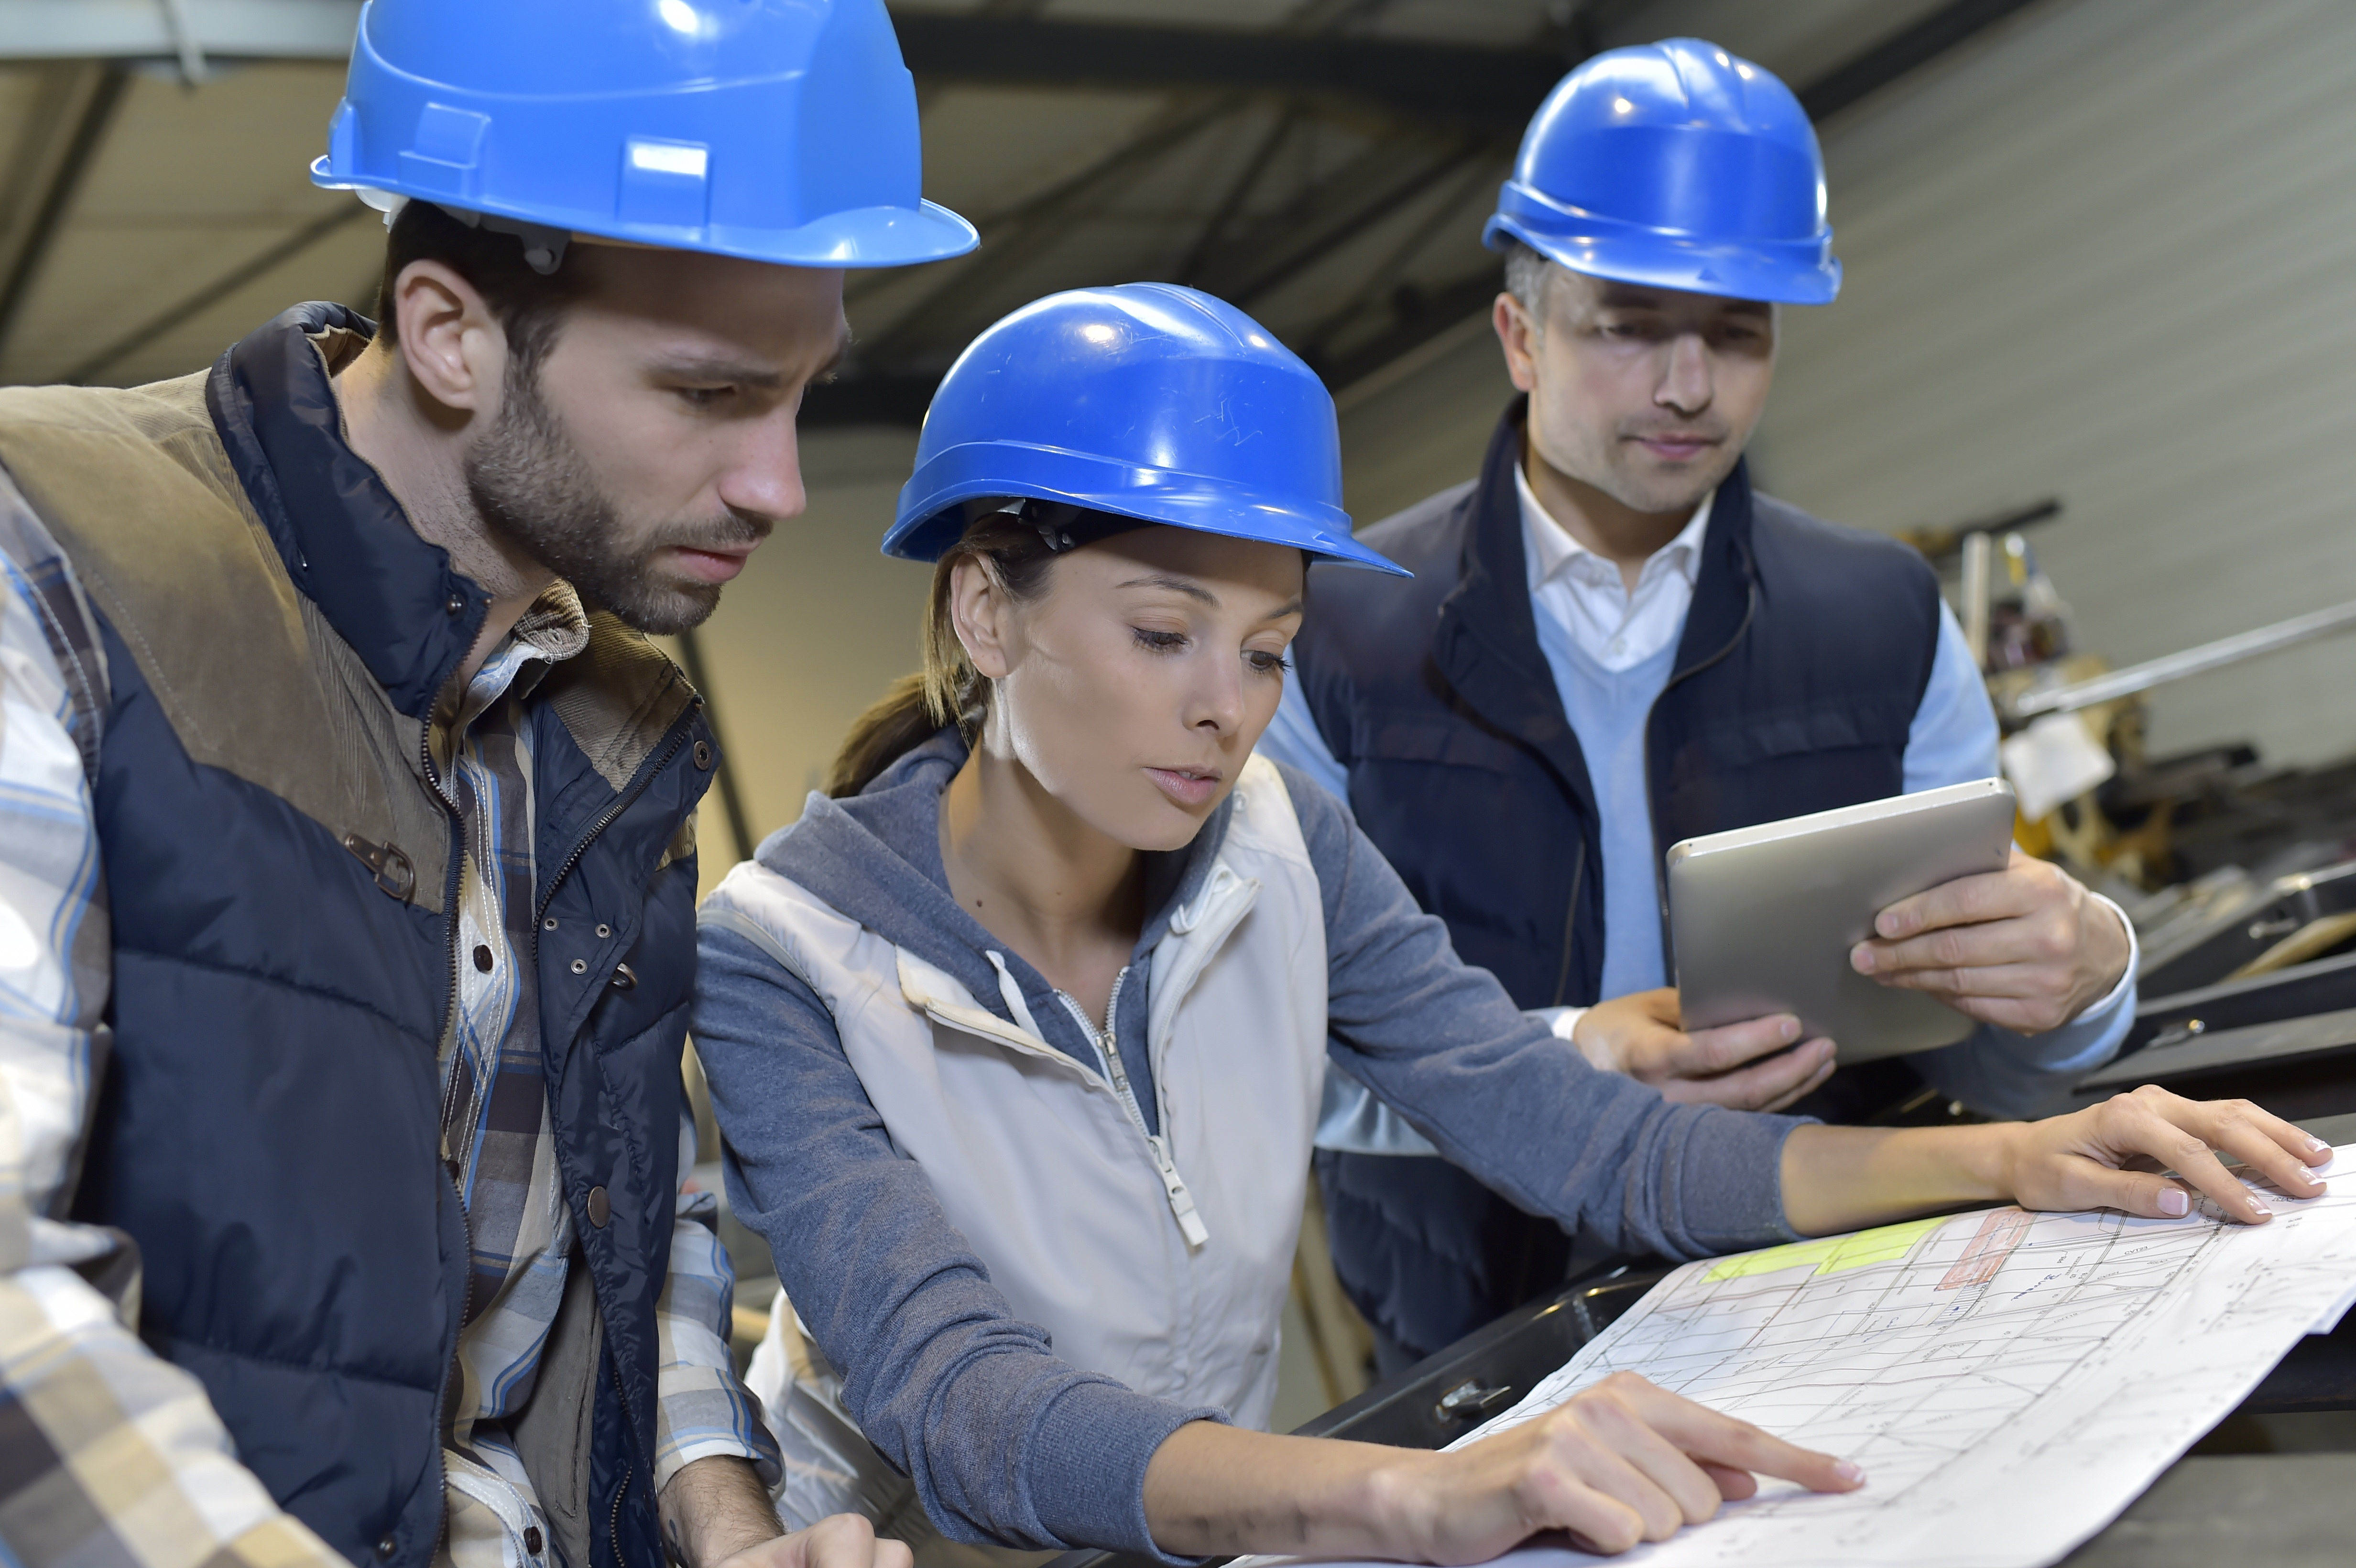 Avoid broadband network installation failures with proper training